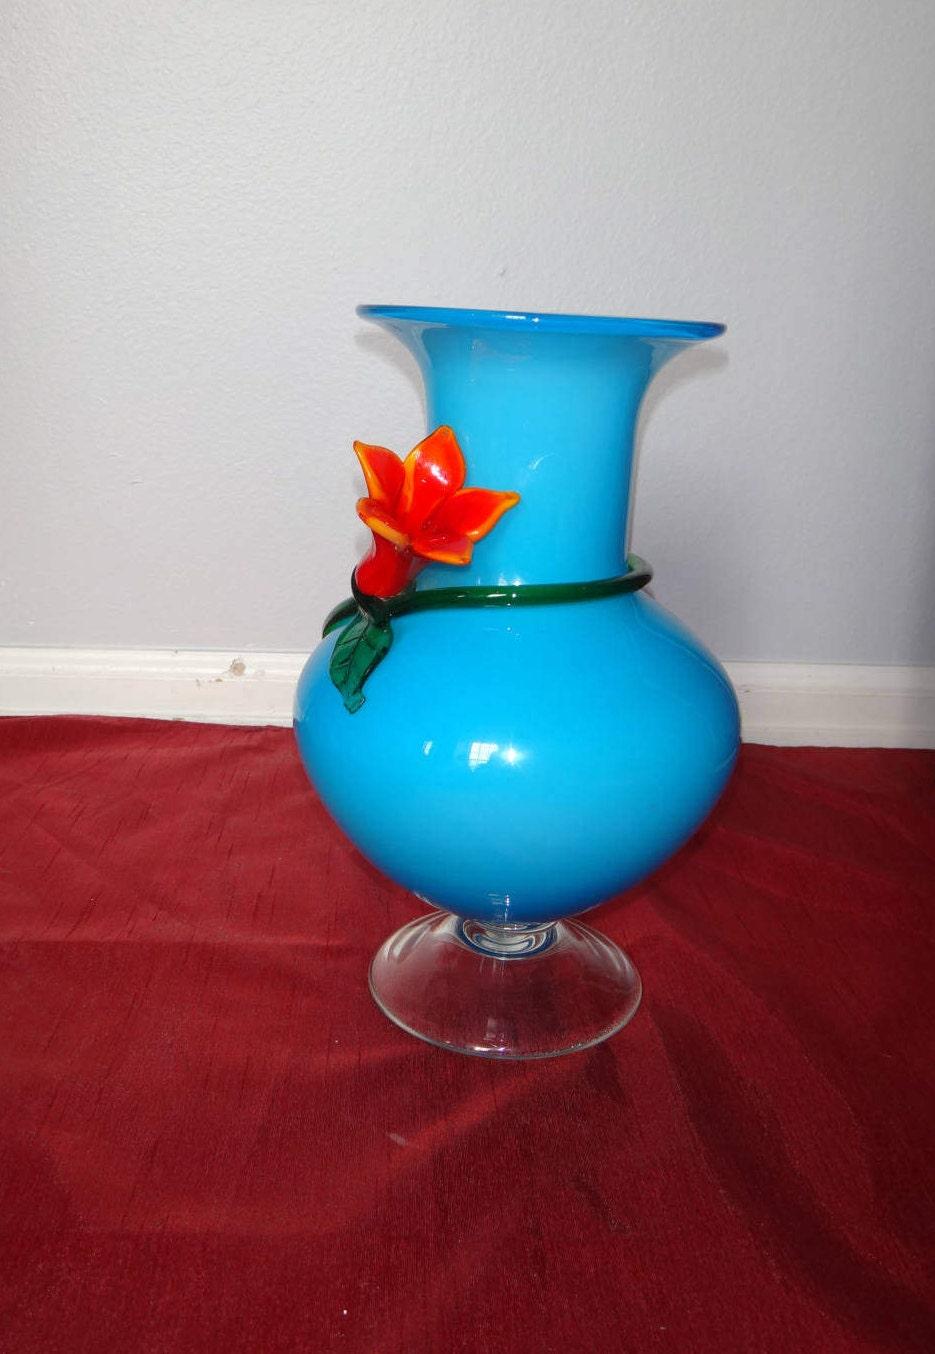 Vintage Hand Blown Gl Vase/ Blue Gl Vase with Red and Orange ... on ve flower, dz flower, mn flower, sc flower, sd flower, uk flower, ls flower, va flower, na flower, ca flower, pa flower, vi flower,